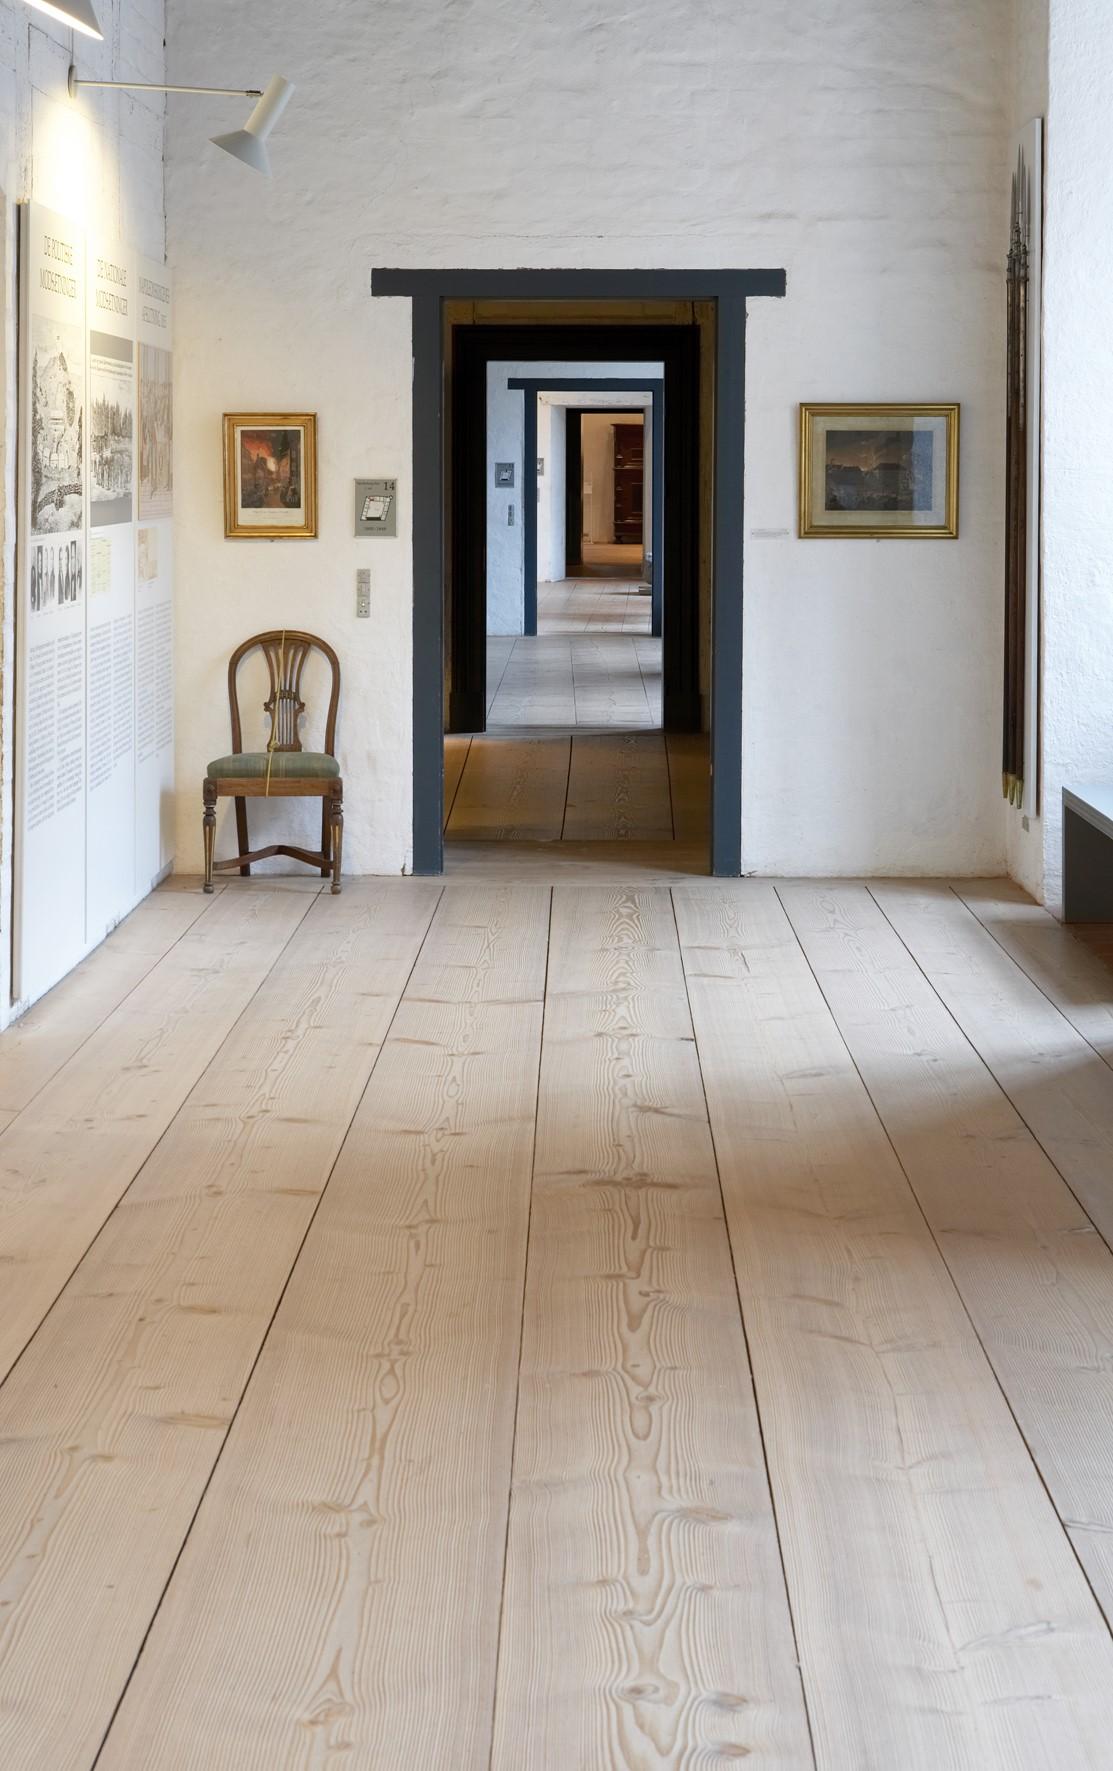 douglas fir floor untreated sonderborg castle hallway dinesen 02.jpg